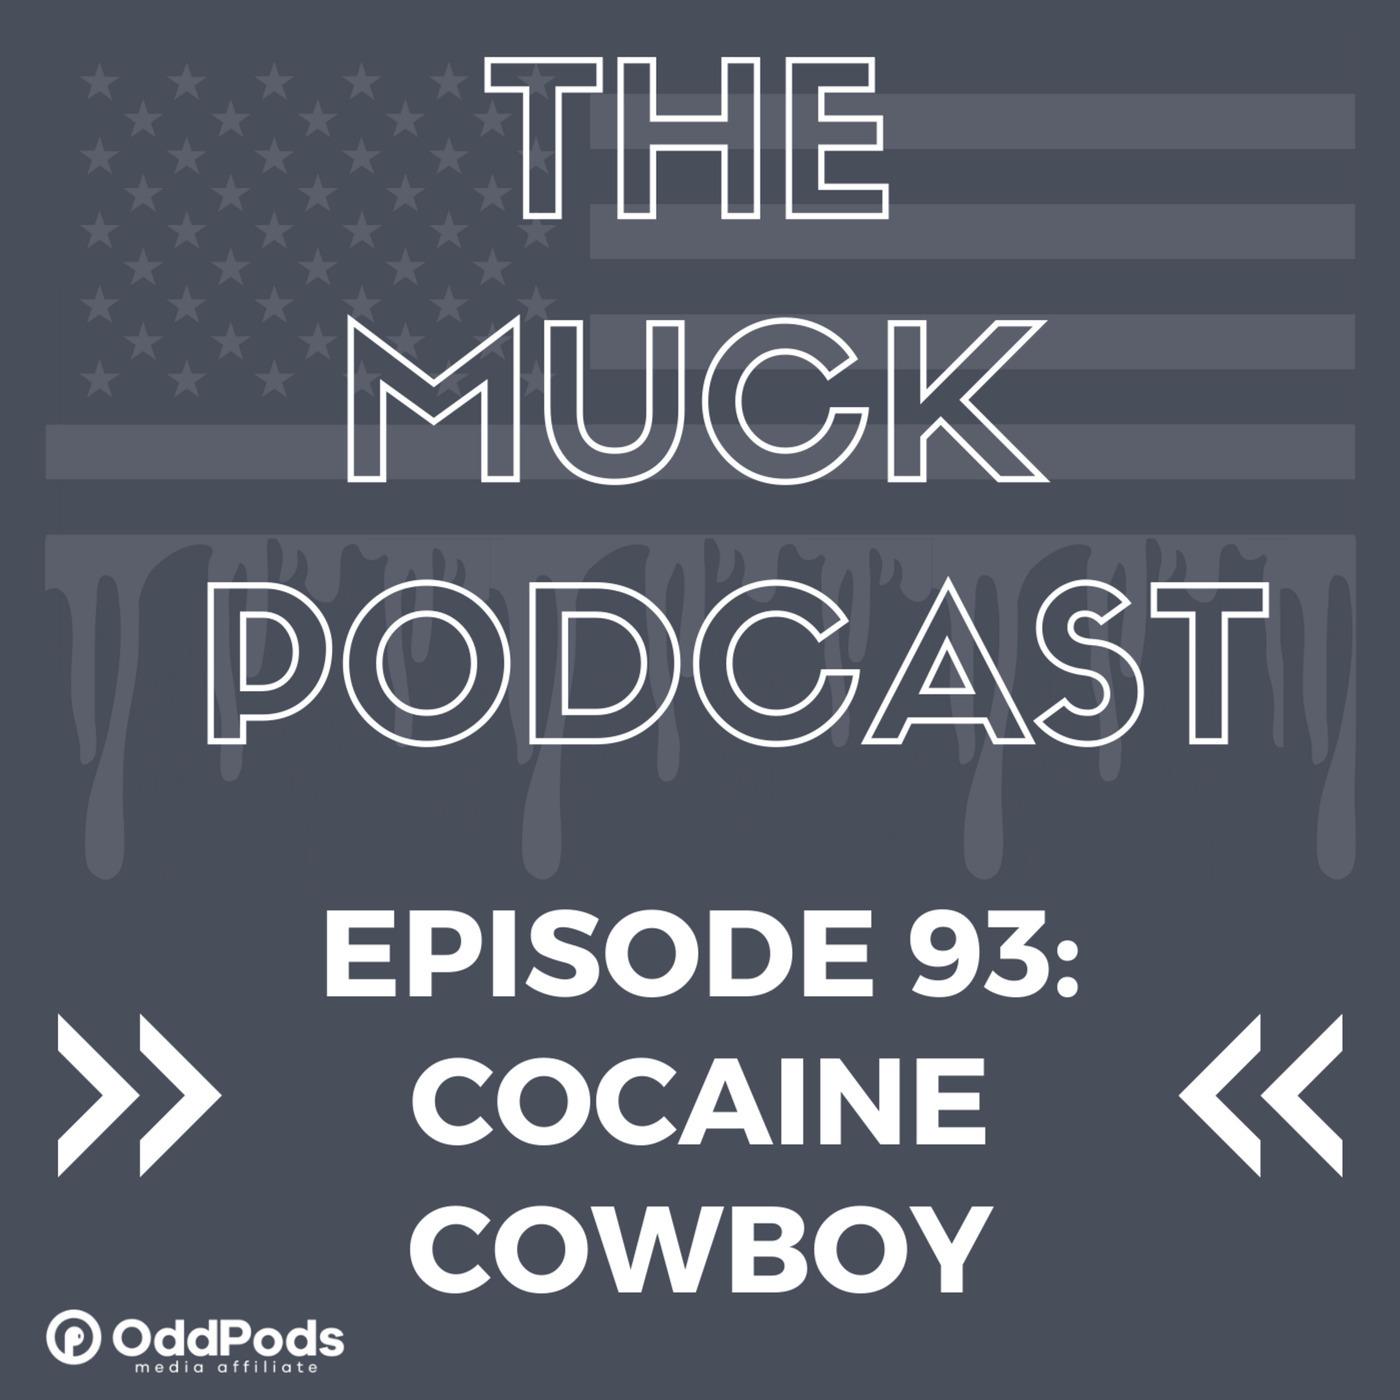 The Muck Podcast ep93-cocainecowboy: Episode 93: Cocaine Cowboy